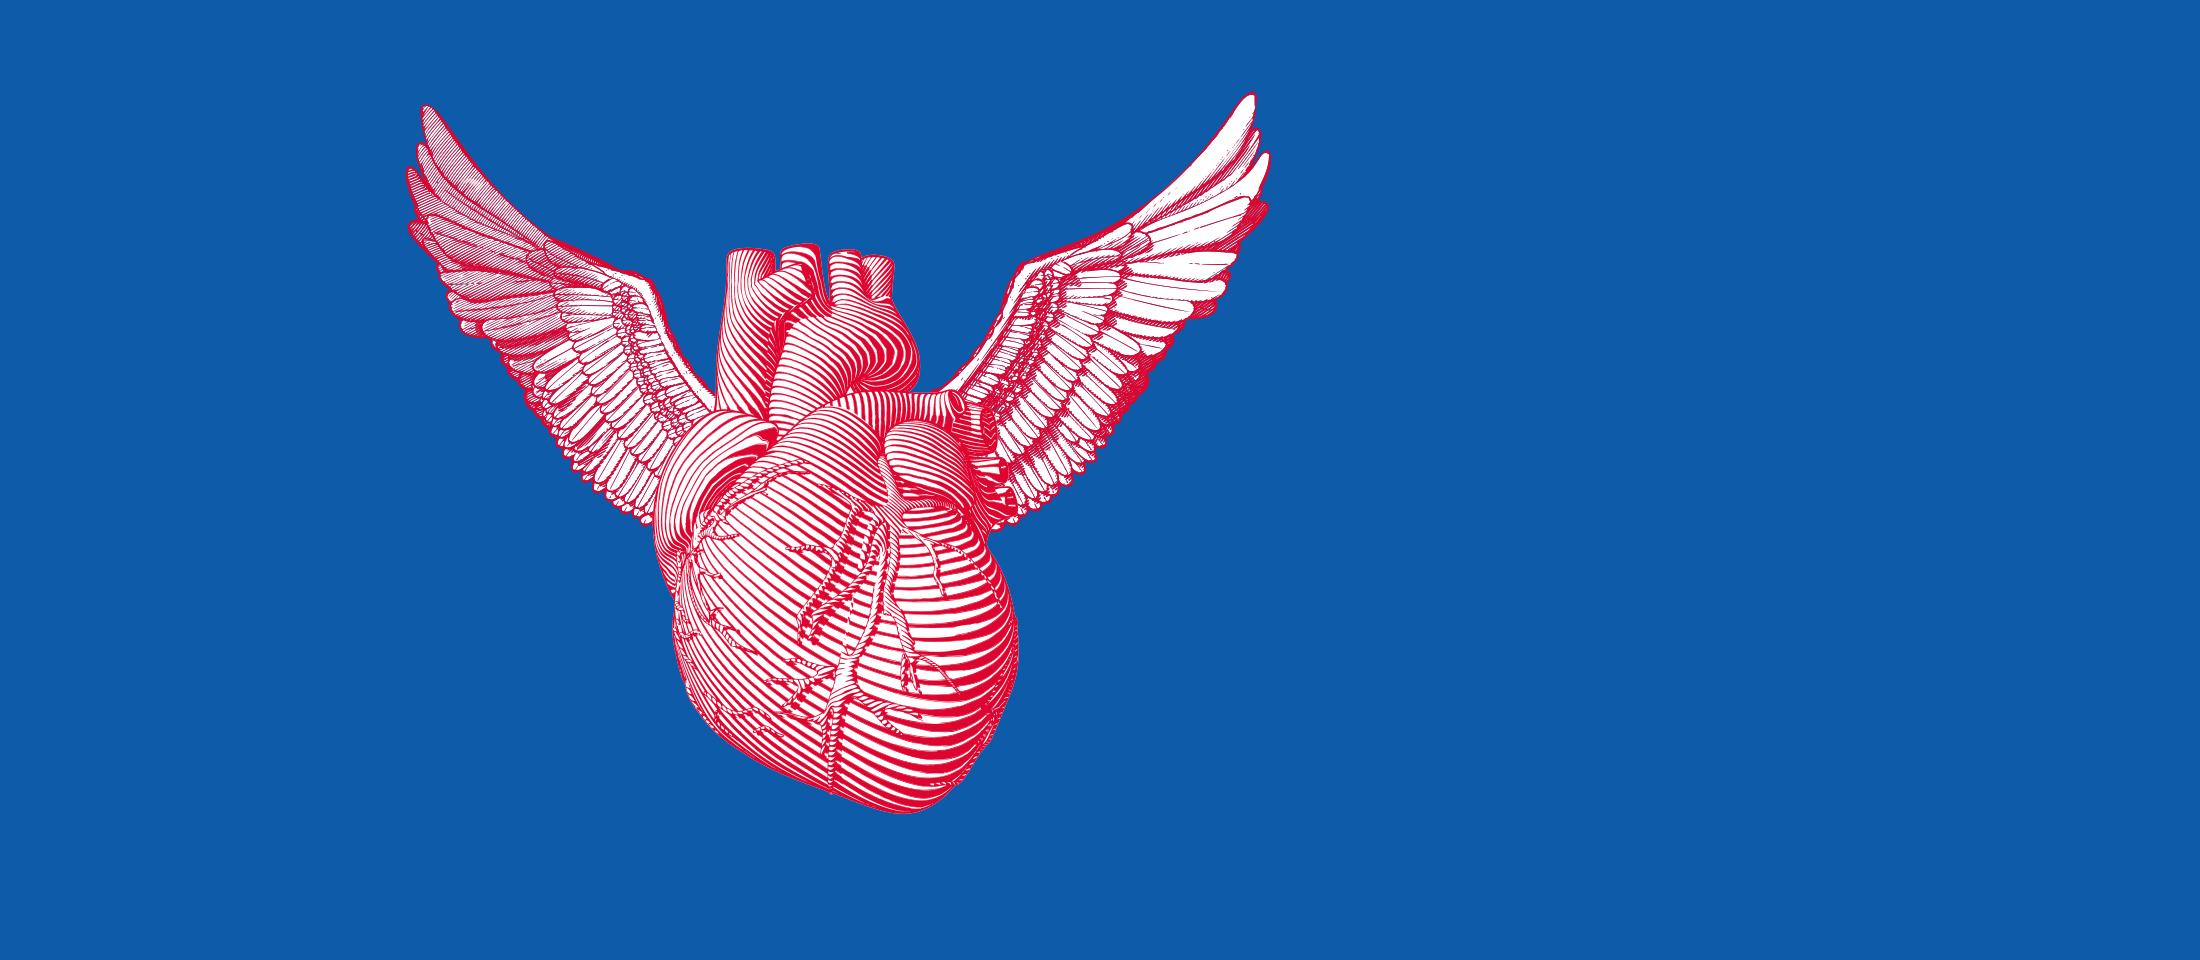 agiou-valentinou-2020_slider